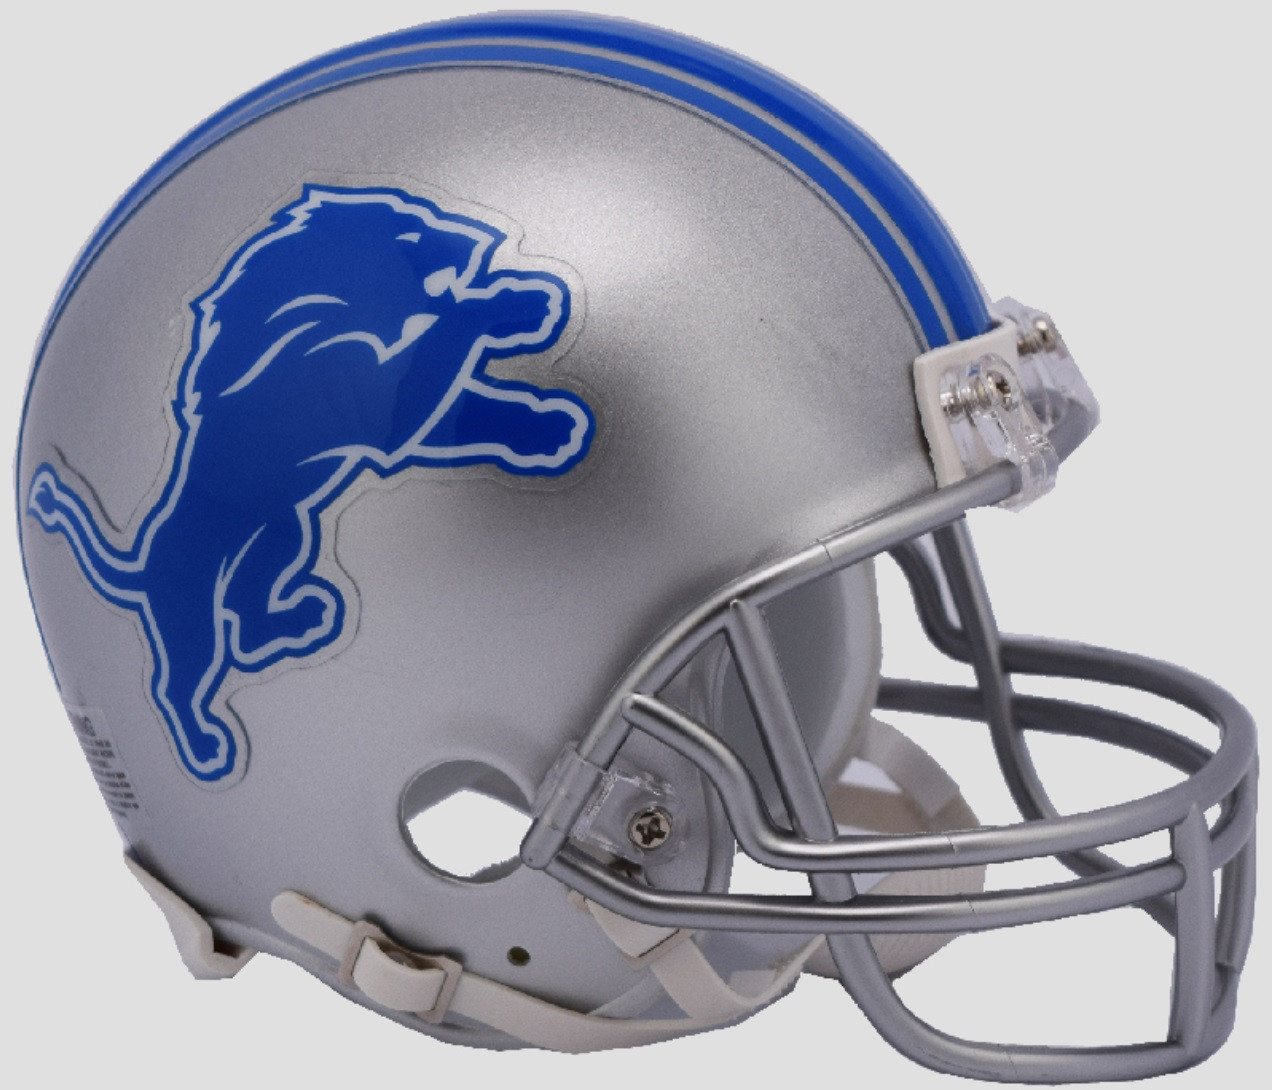 DETROIT LIONS NFL RIDDELL MINI POCKET PRO REVOLUTION HELMET